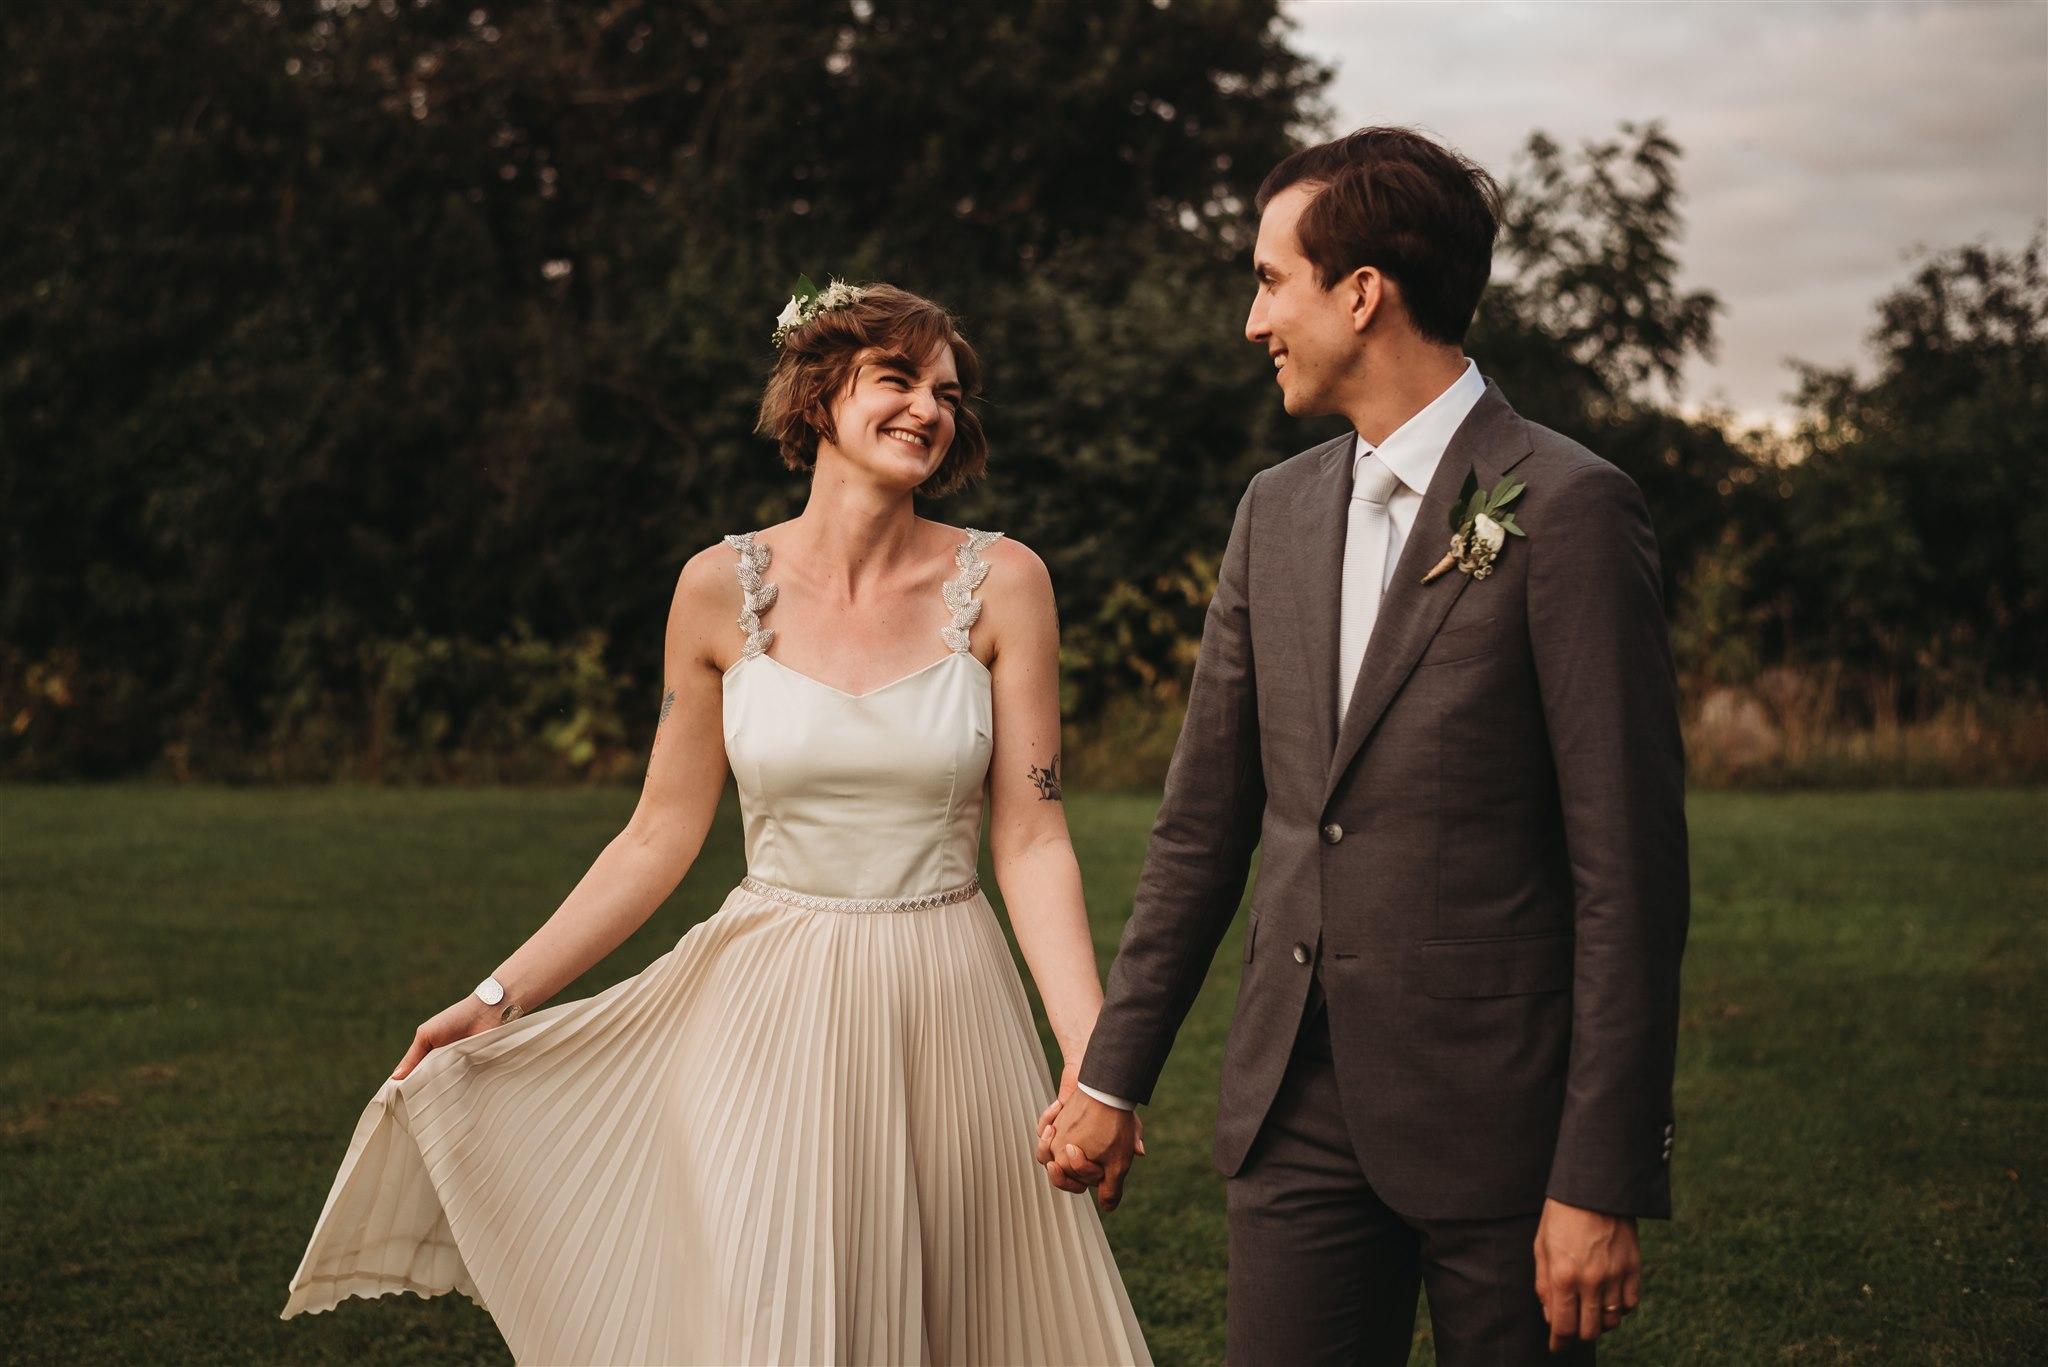 fanshawe conservation area wedding photos 518 1 - Watson Porter Pavillion Wedding